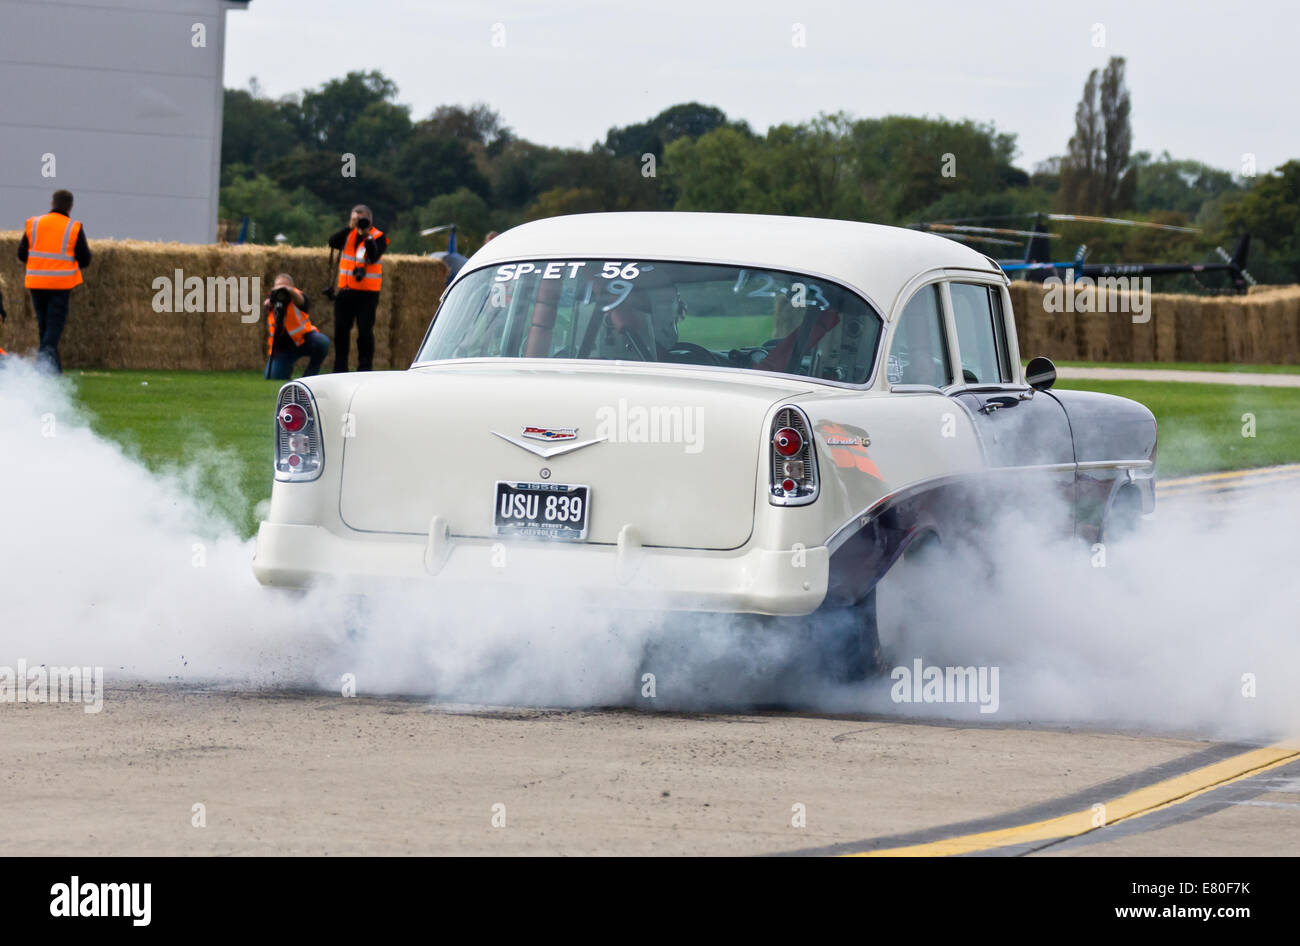 Sywell Aerodrome, Northamptonshire, UK. The Footman James Classic 'Piston & Props'. Drag cars burn rubber - Stock Image